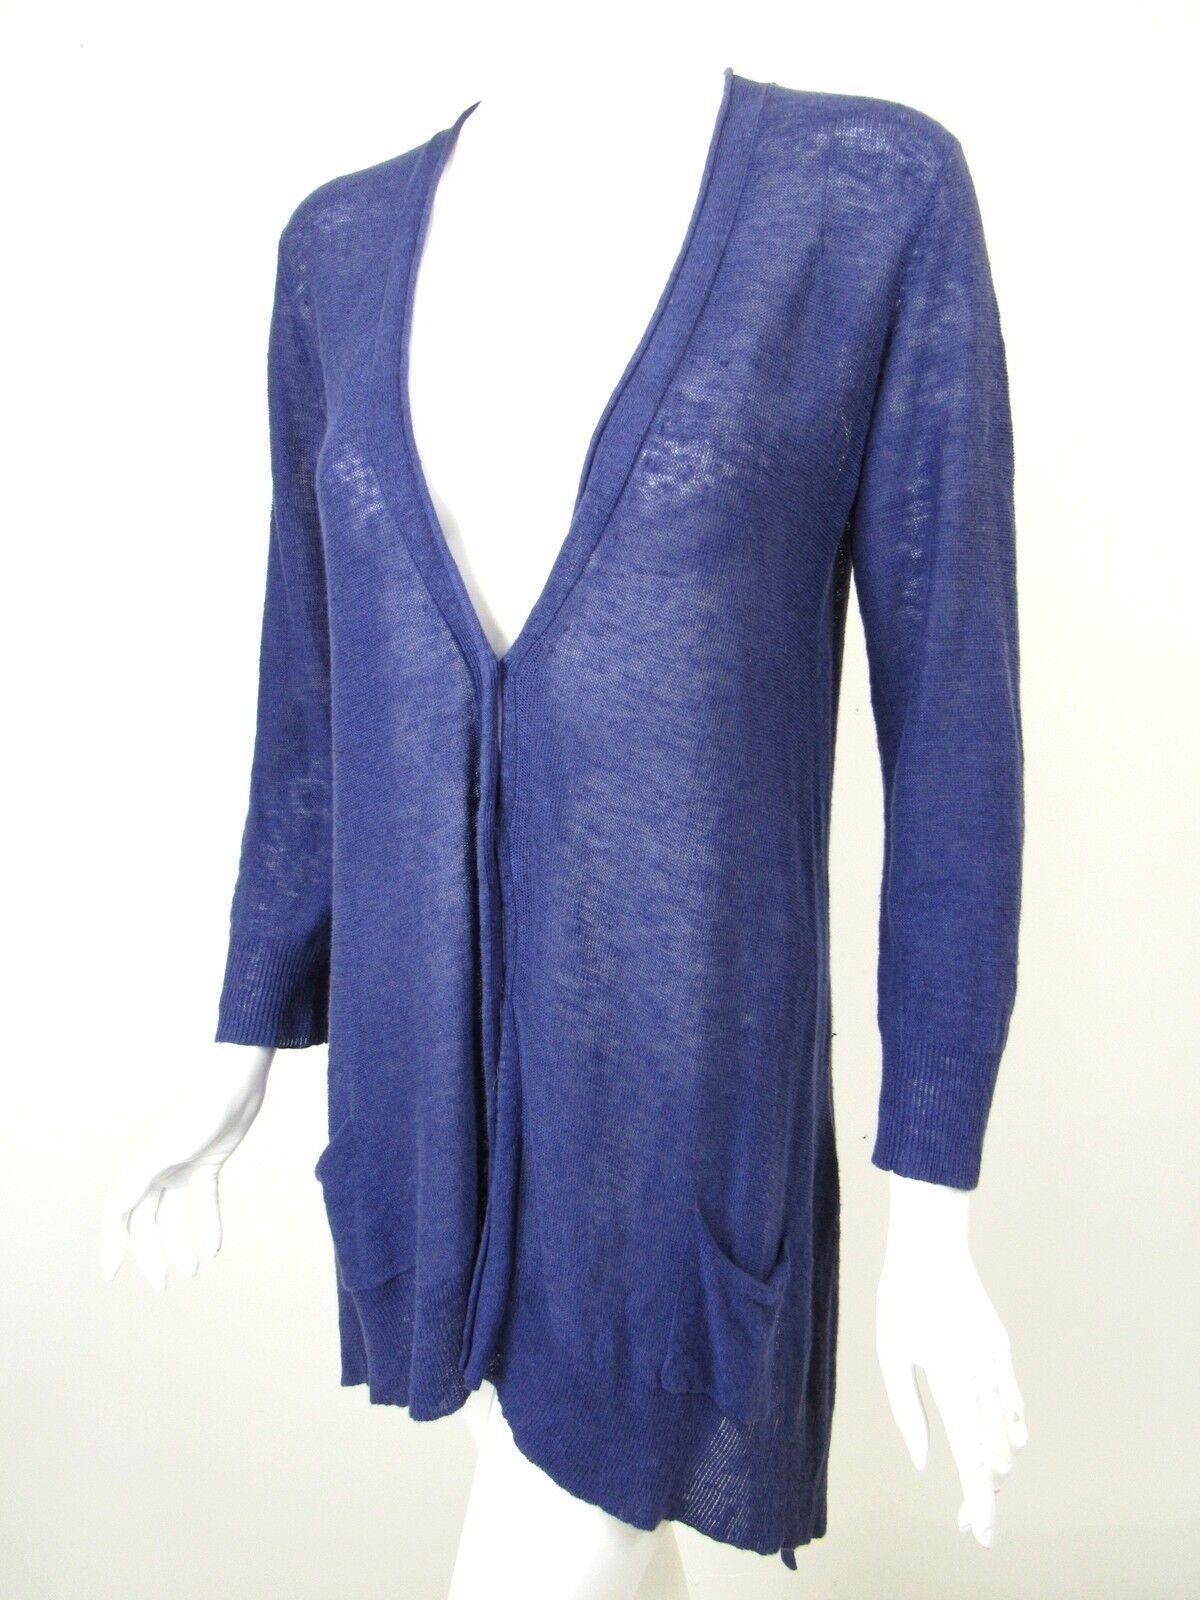 EILEEN FISHER Indigo bluee Linen Knit Boxy Asymmetric Hem Cardigan Sweater sz XS